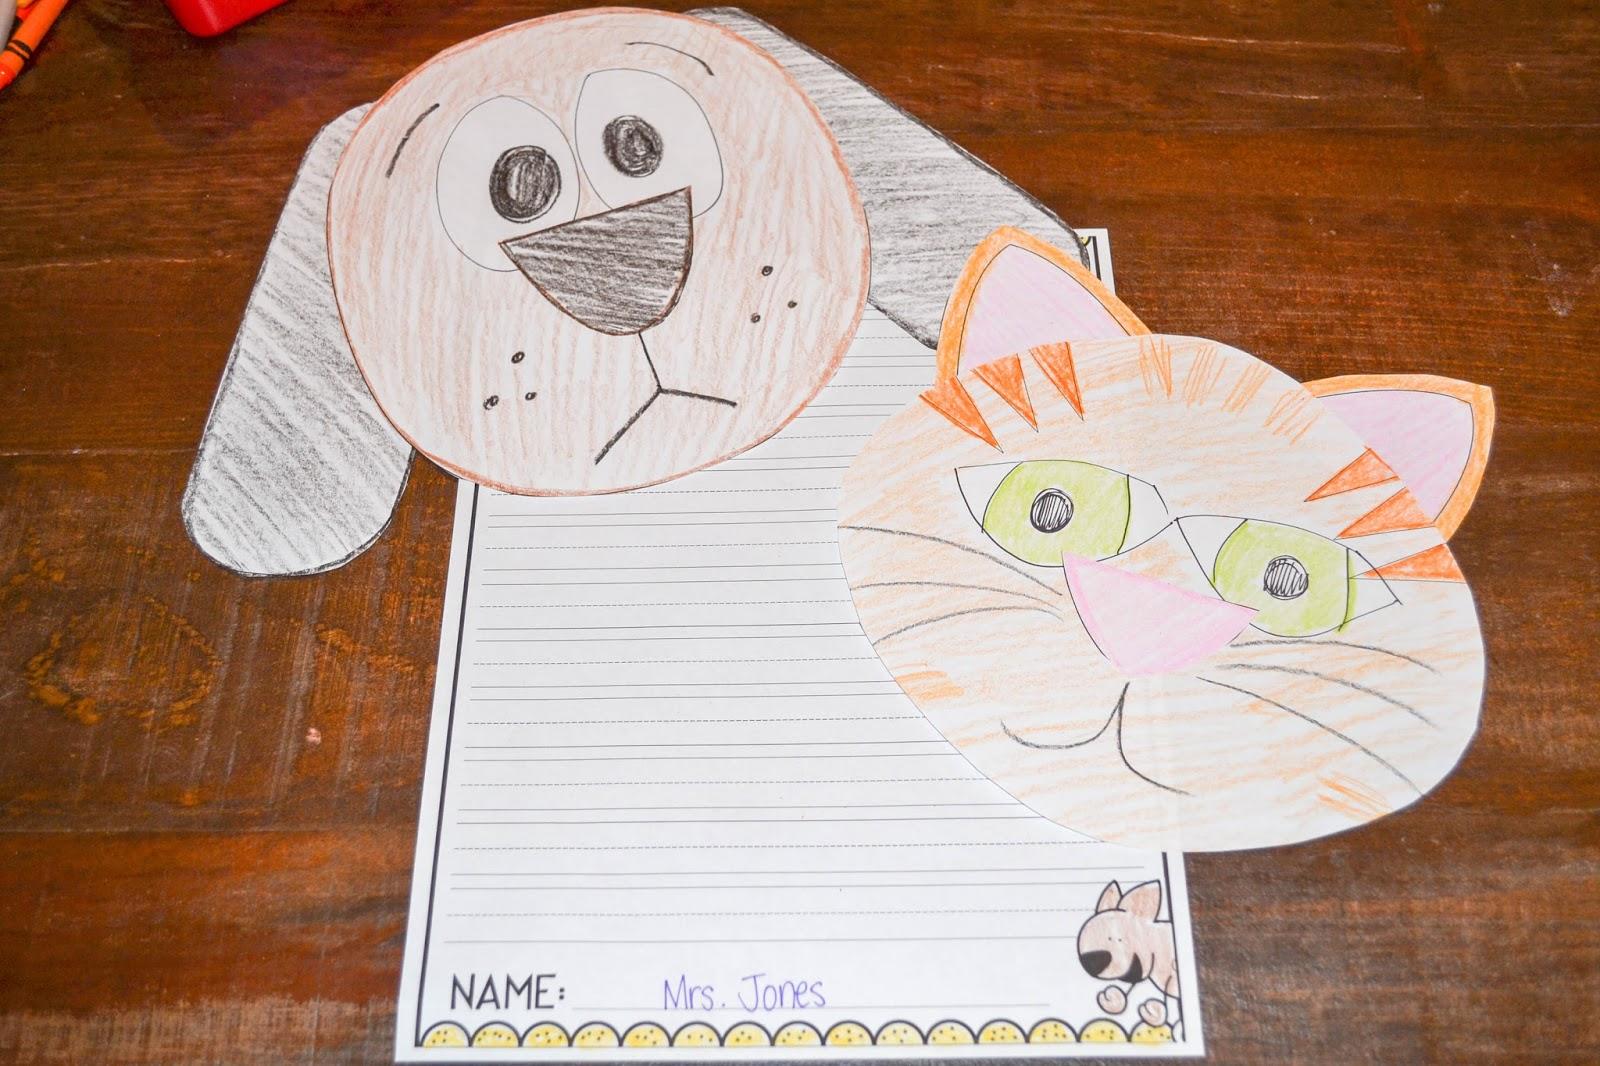 Susan Jones Teaching Cats Vs Dogs